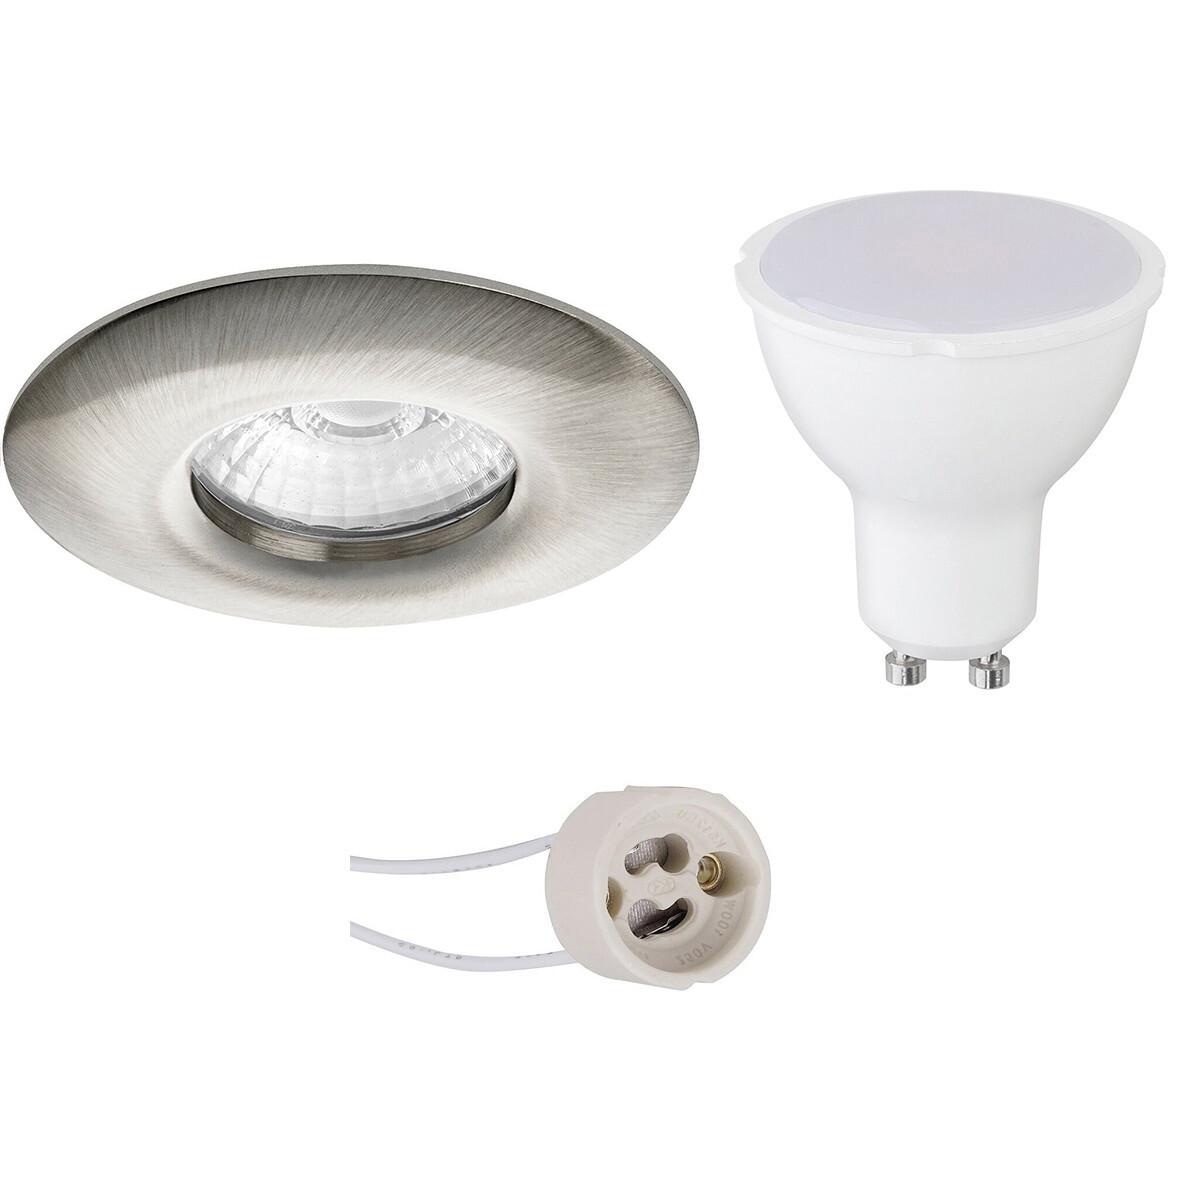 LED Spot Set - Pragmi Luno Pro - Waterdicht IP65 - GU10 Fitting - Inbouw Rond - Mat Nikkel - 6W - He